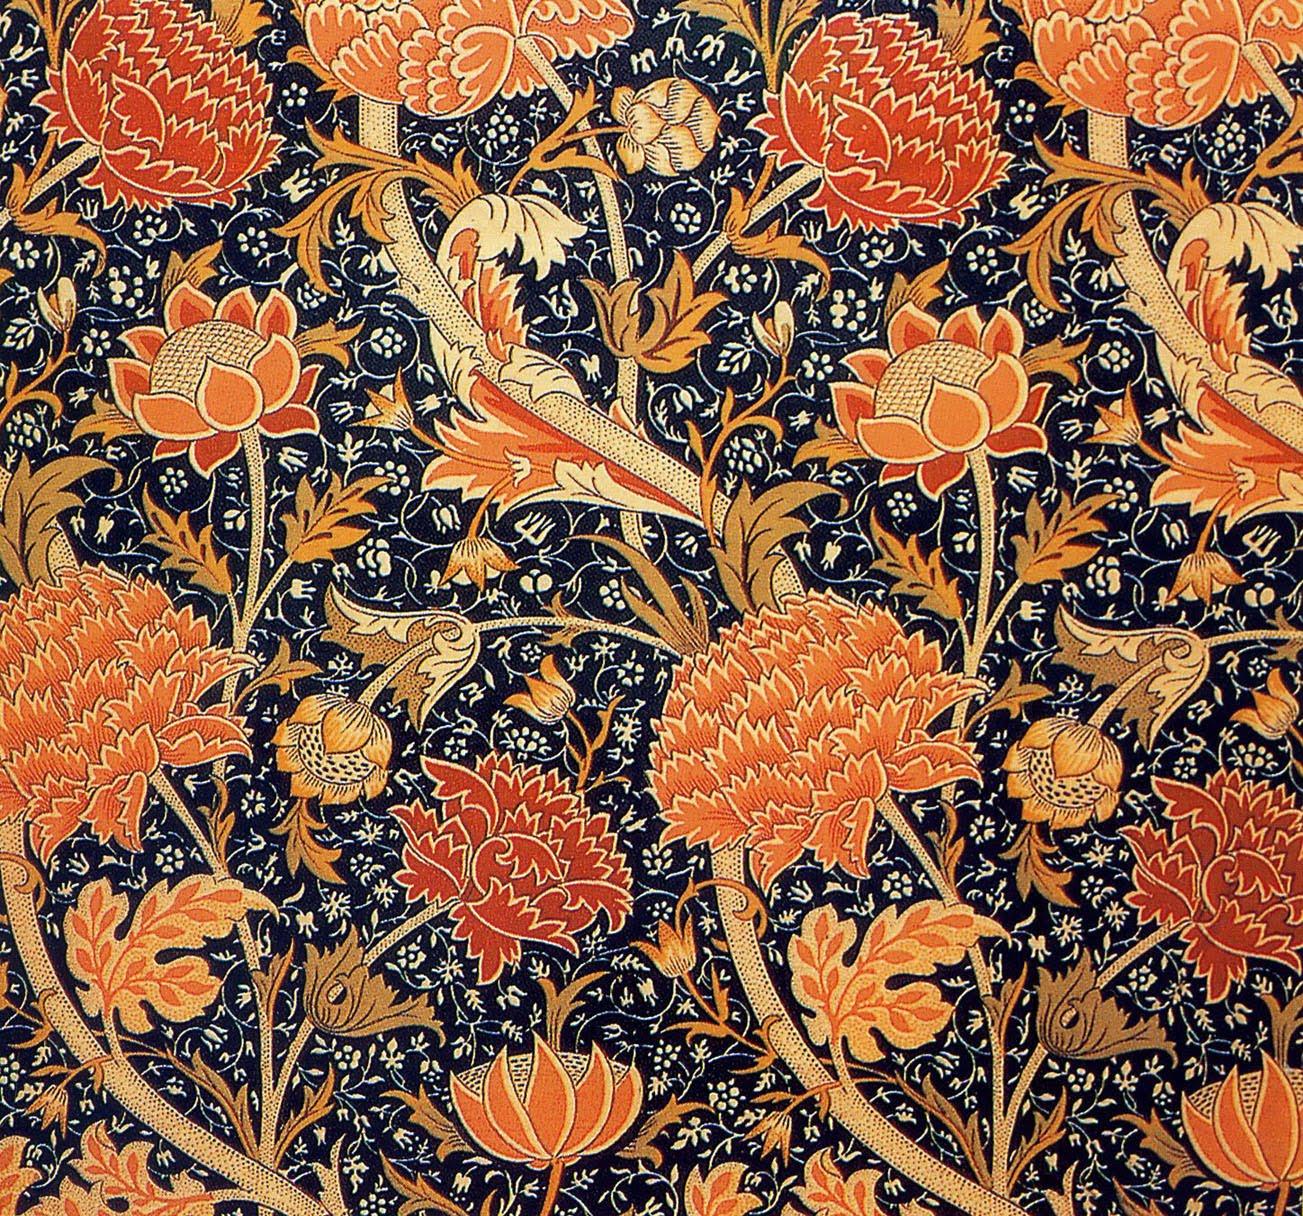 [49+] Arts and Crafts Movement Wallpaper on WallpaperSafari